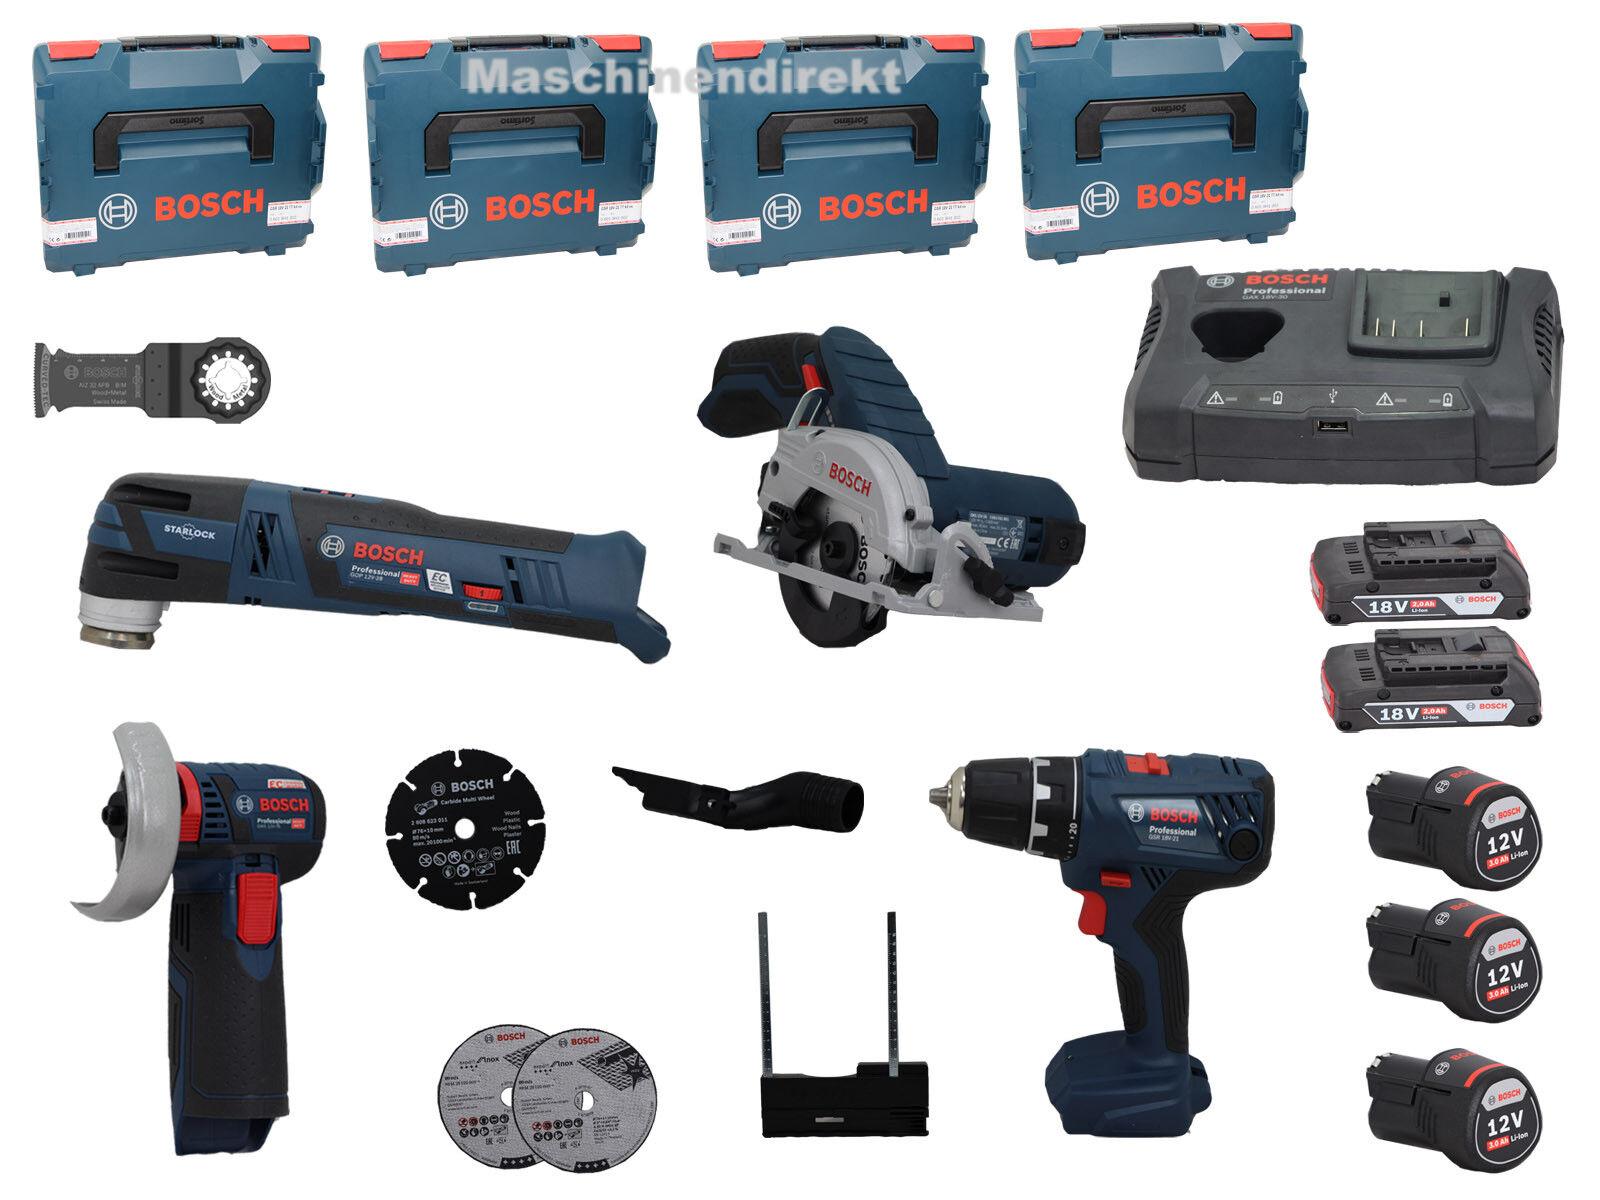 Bosch Akku Set  GWS12V-76 + GSR18V-21 + GKS12V-26 + GOP12V-28 + GAX18V-30 + Akku